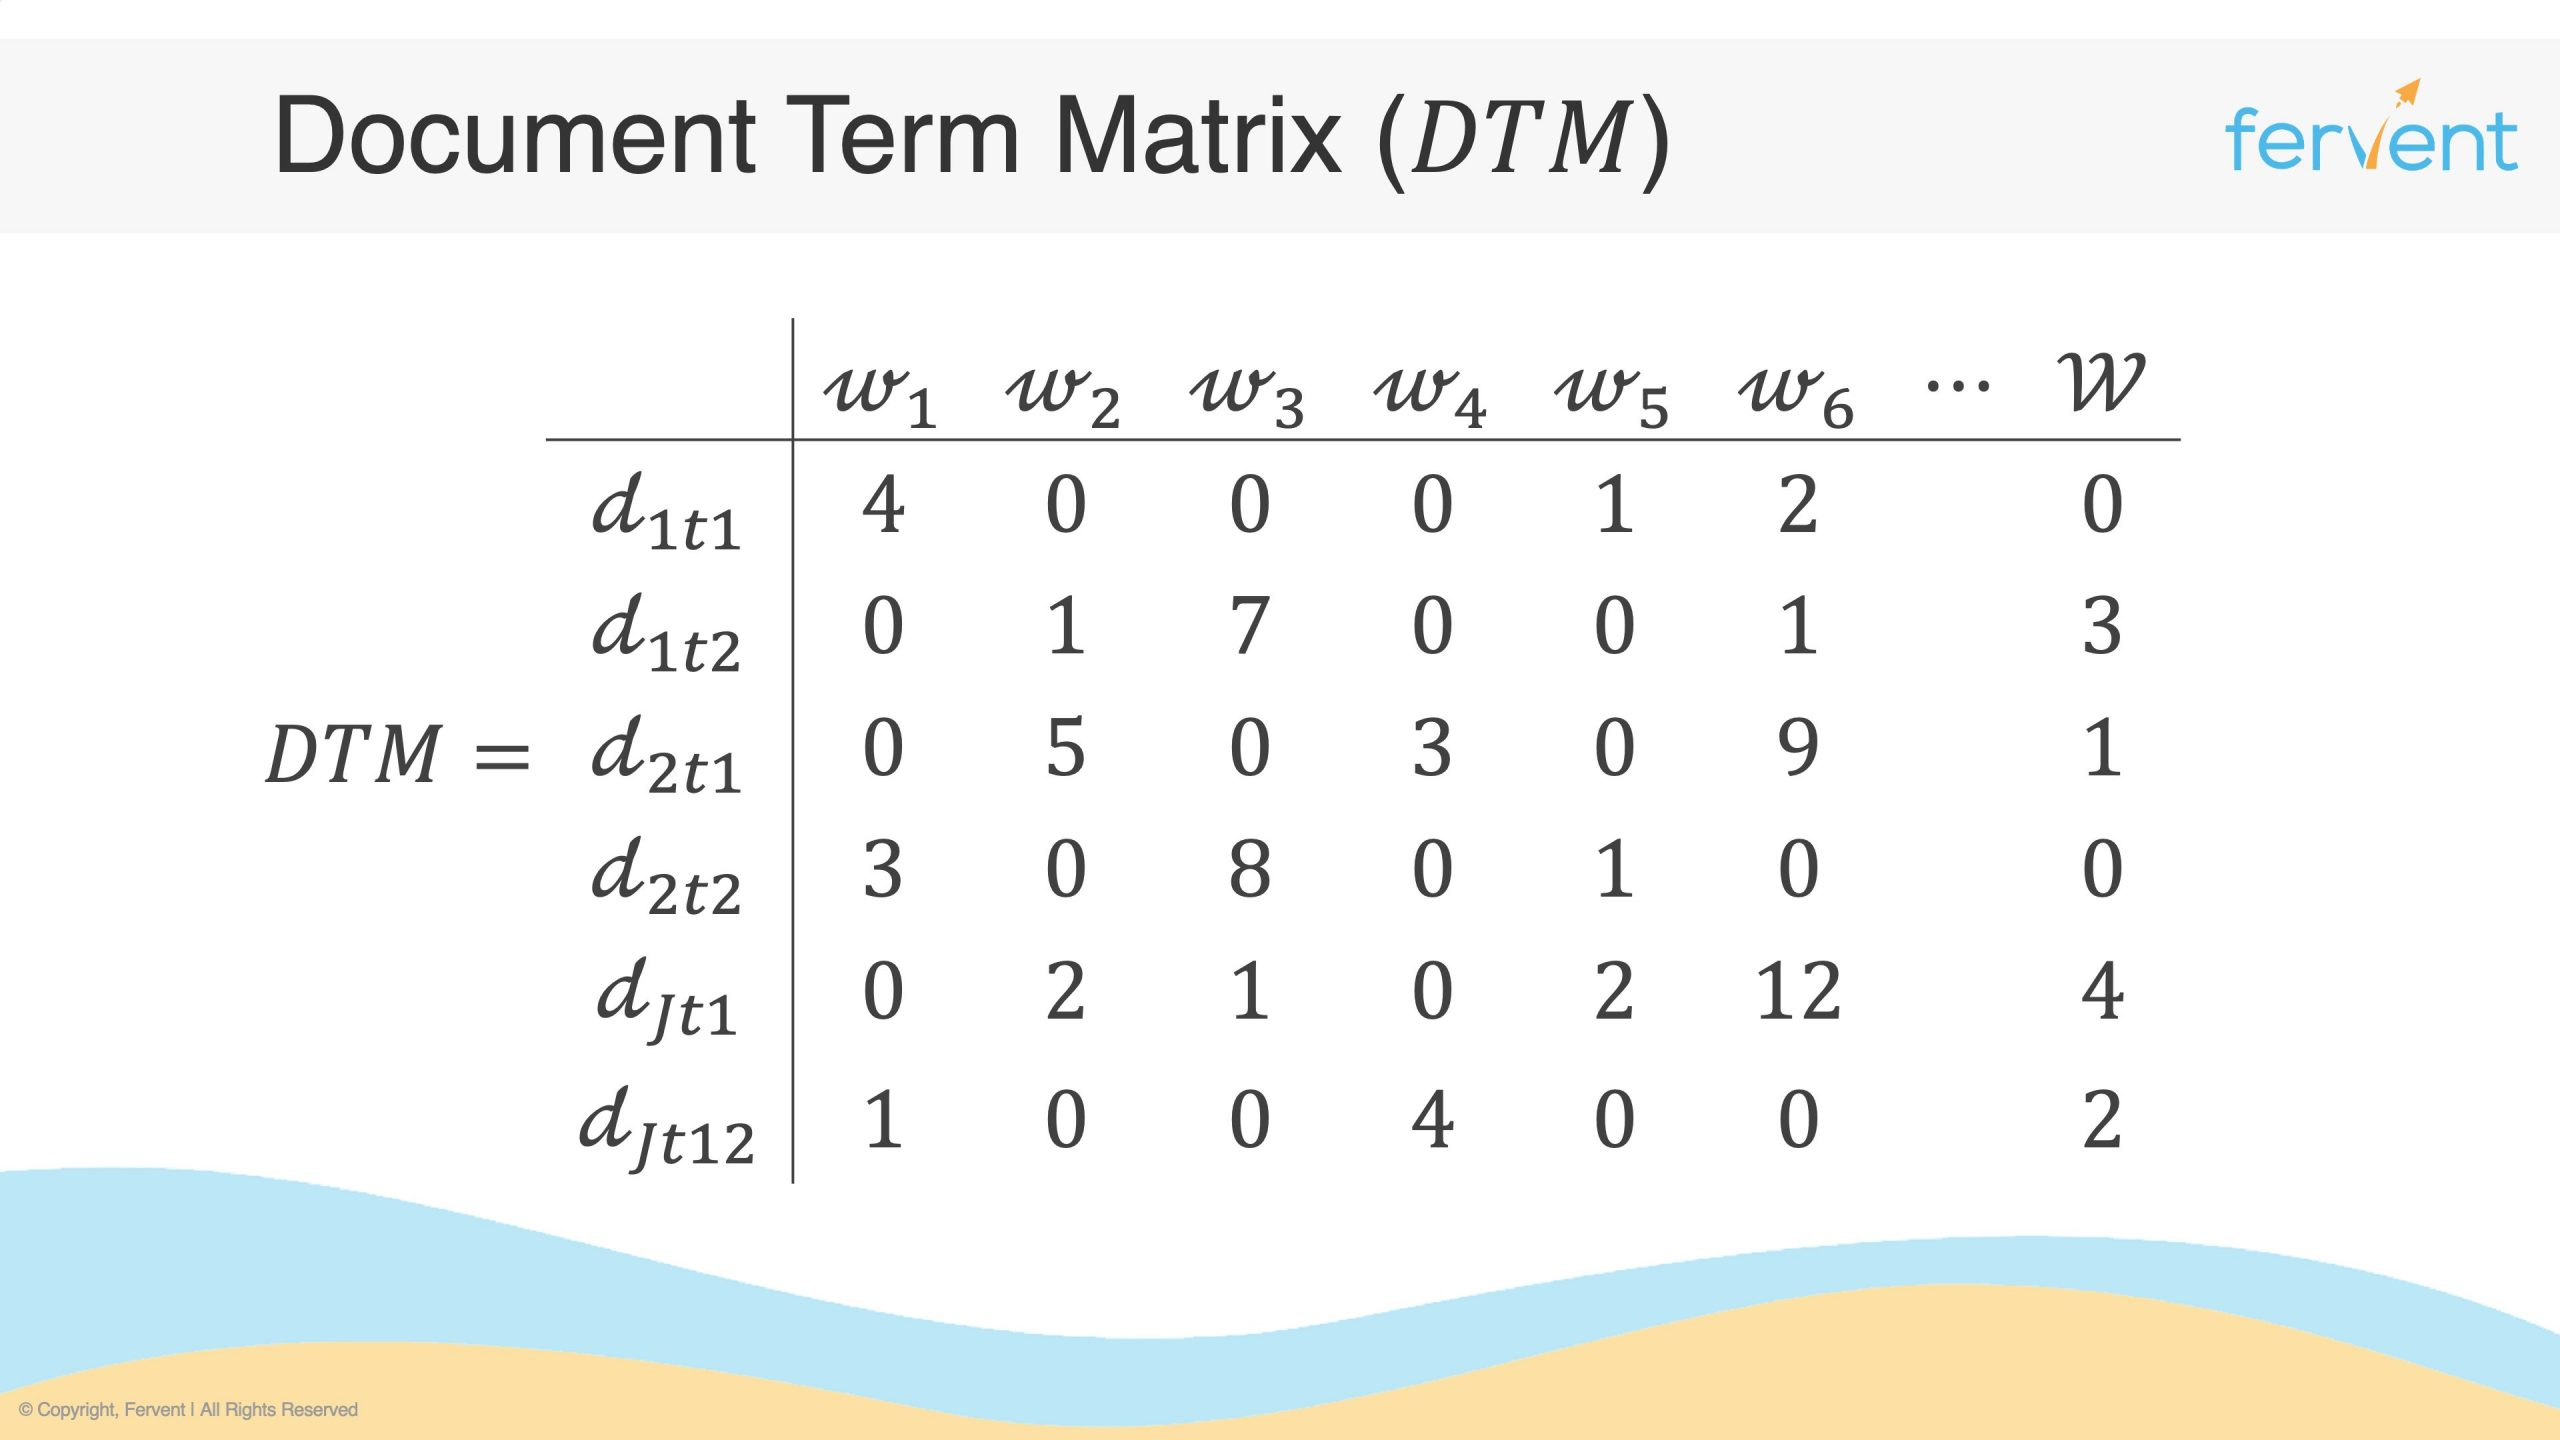 Slide showcasing a document term matrix